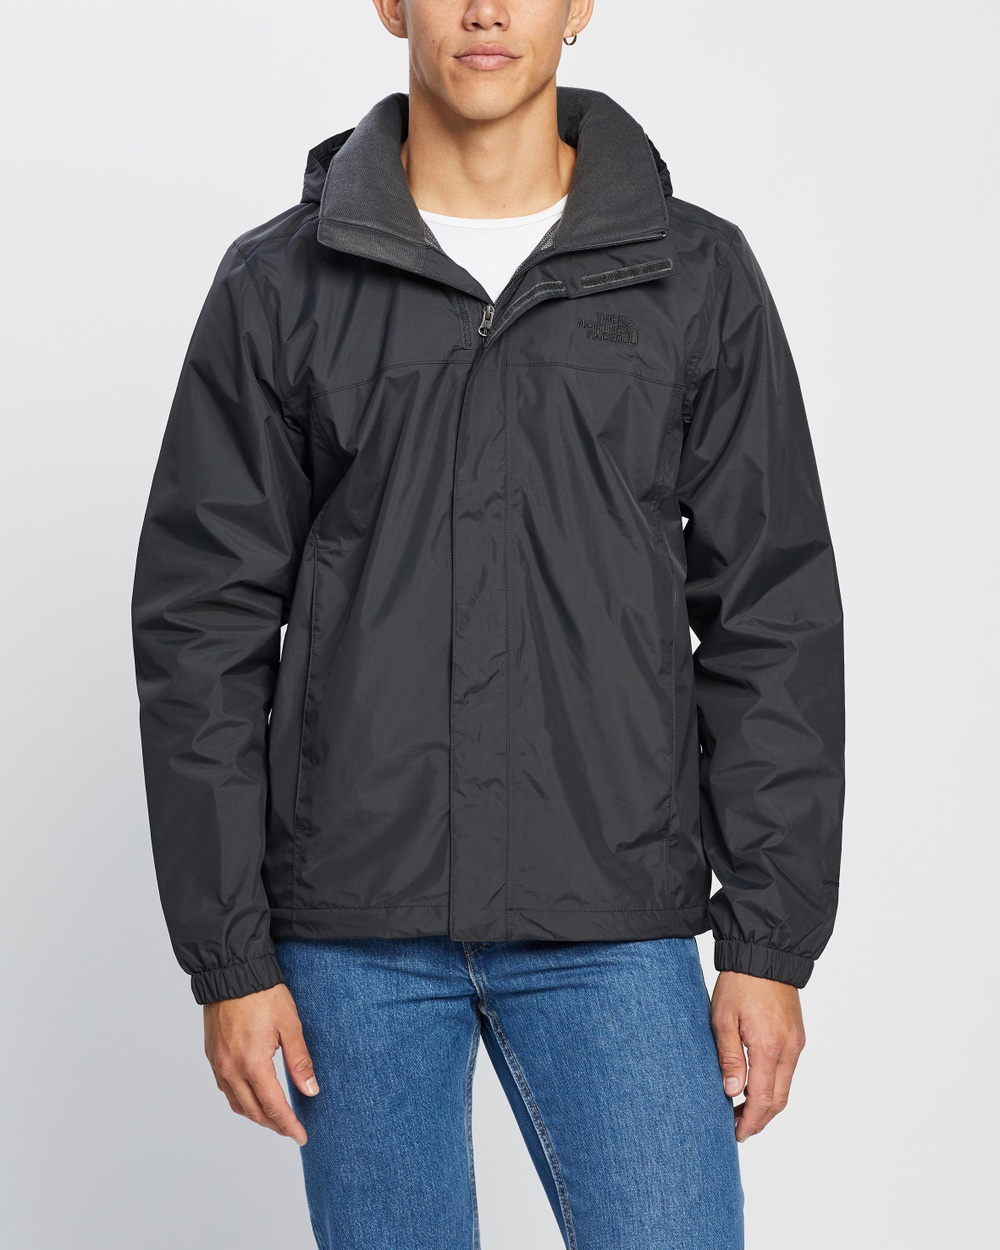 The North Face Resolve 2 Jacket Coats & Jackets Asphalt Grey